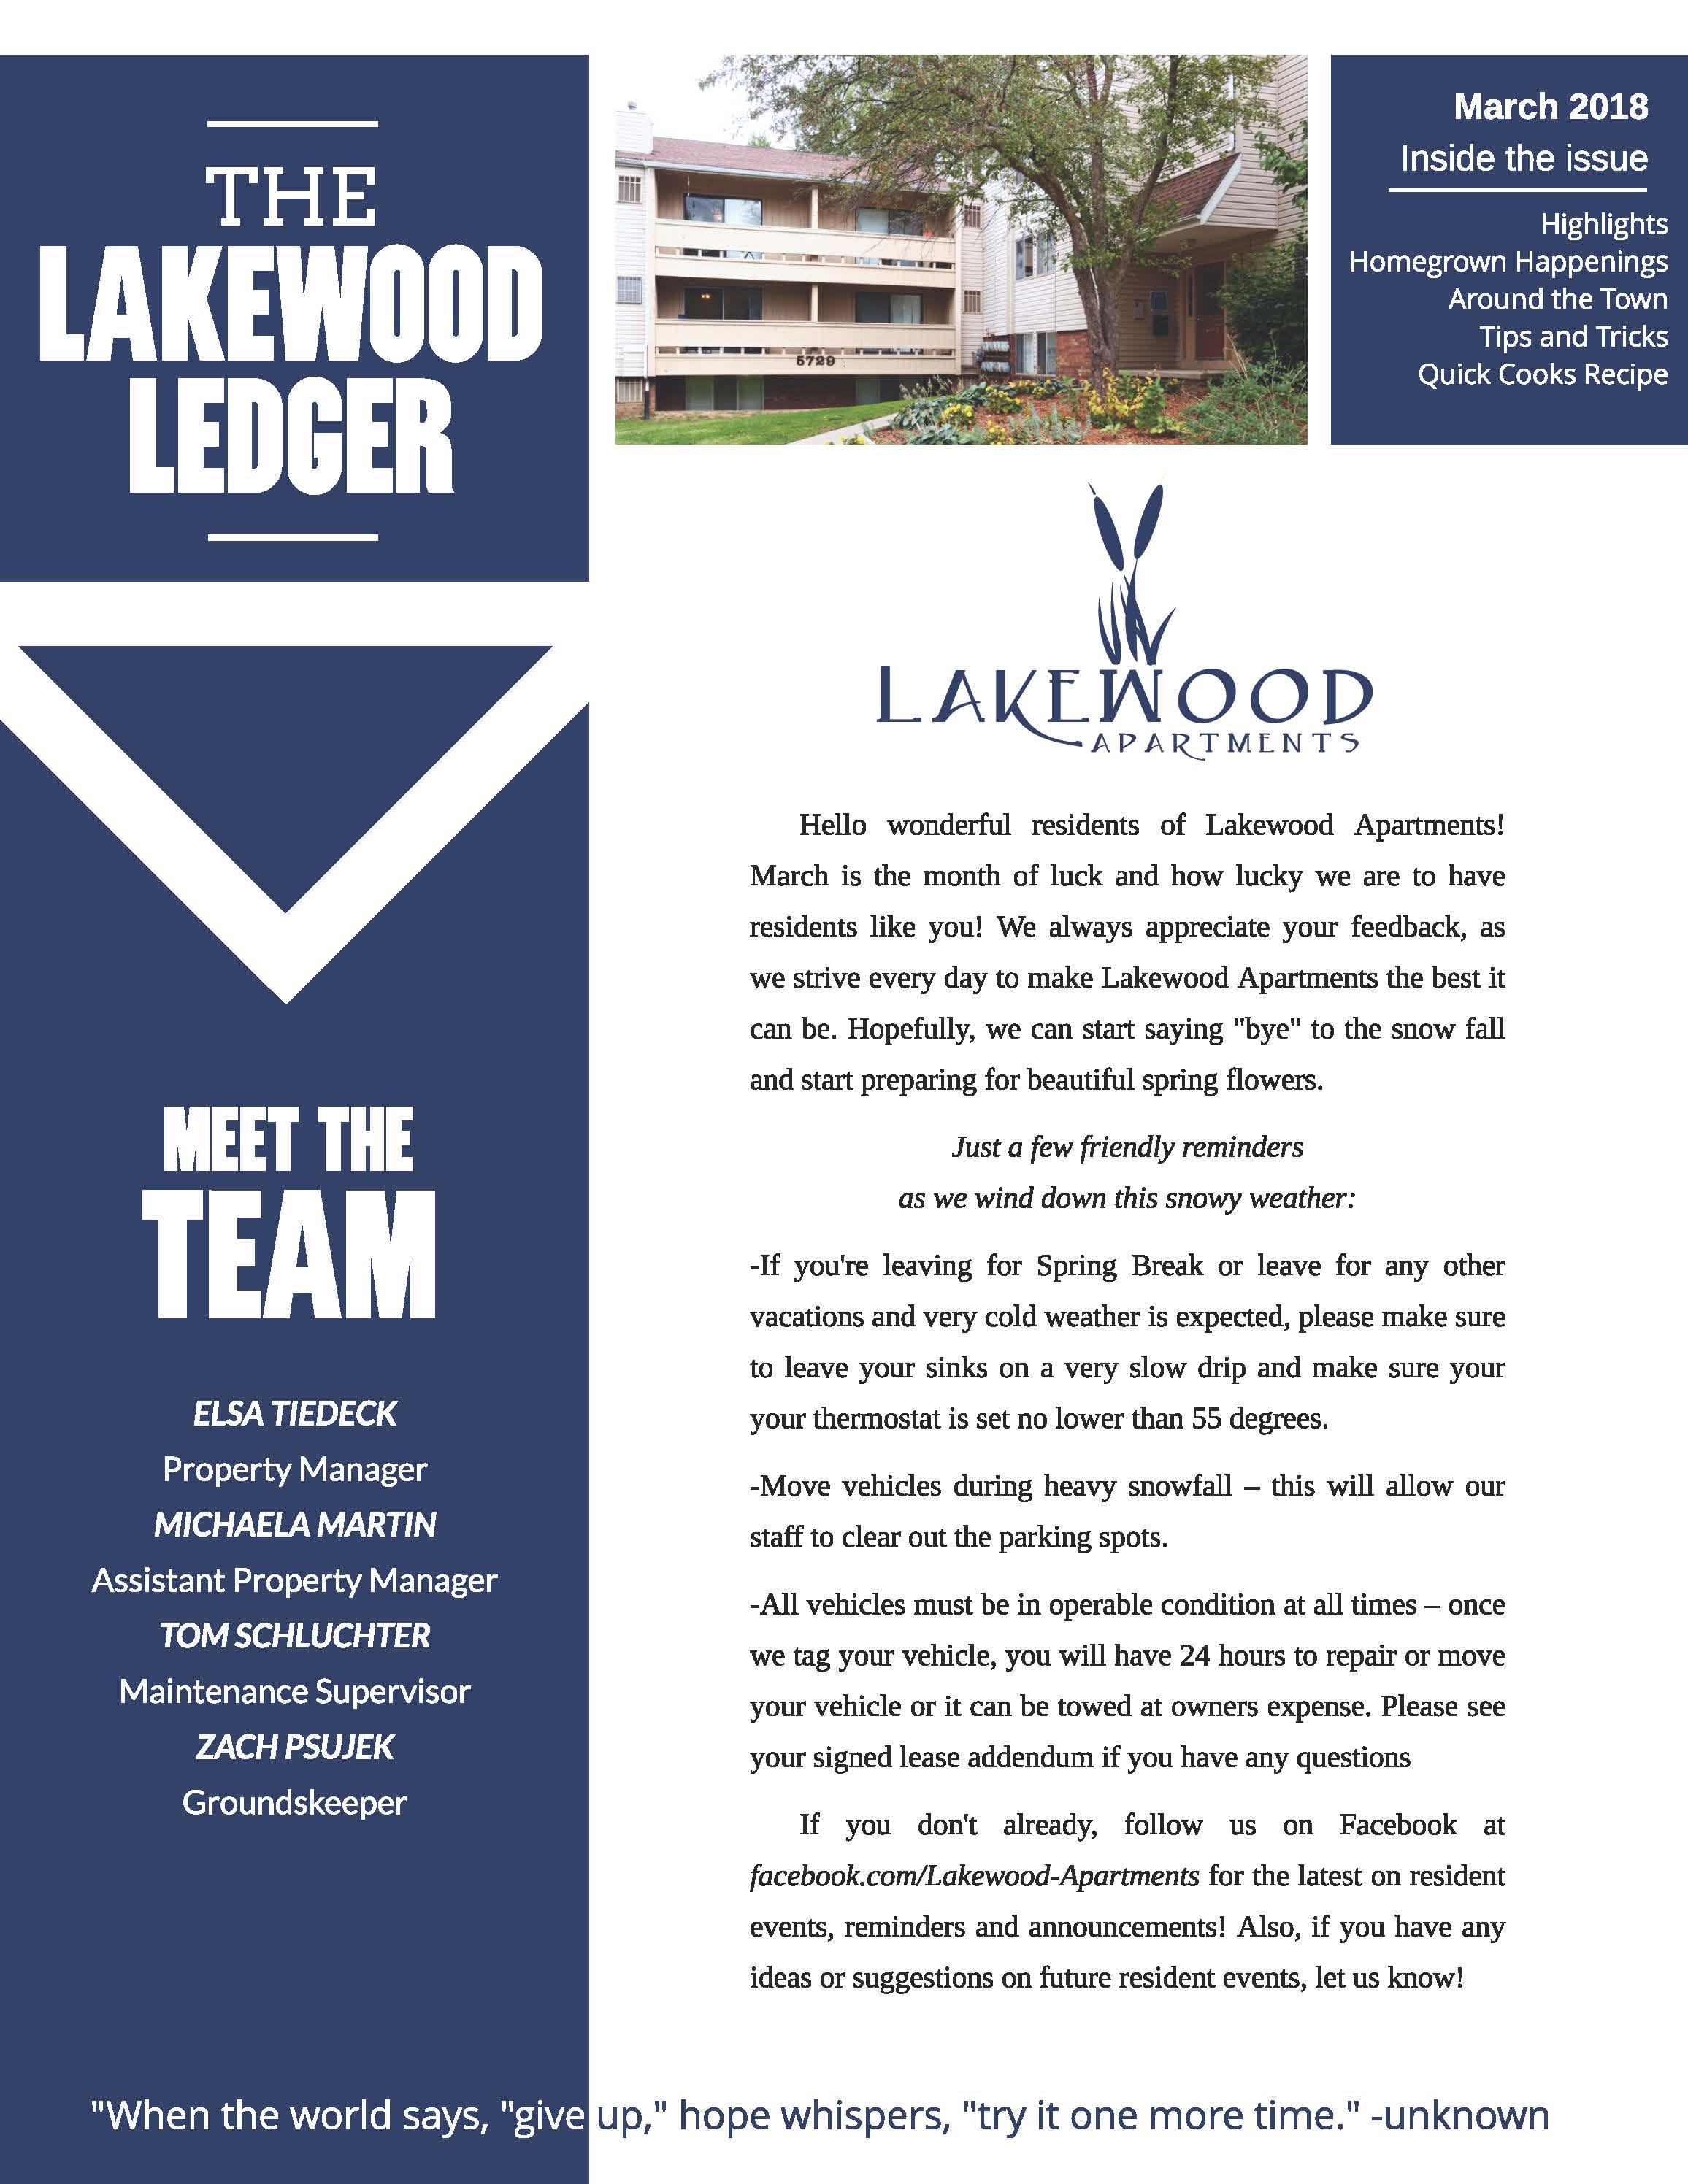 The Lakewood Apartments Community